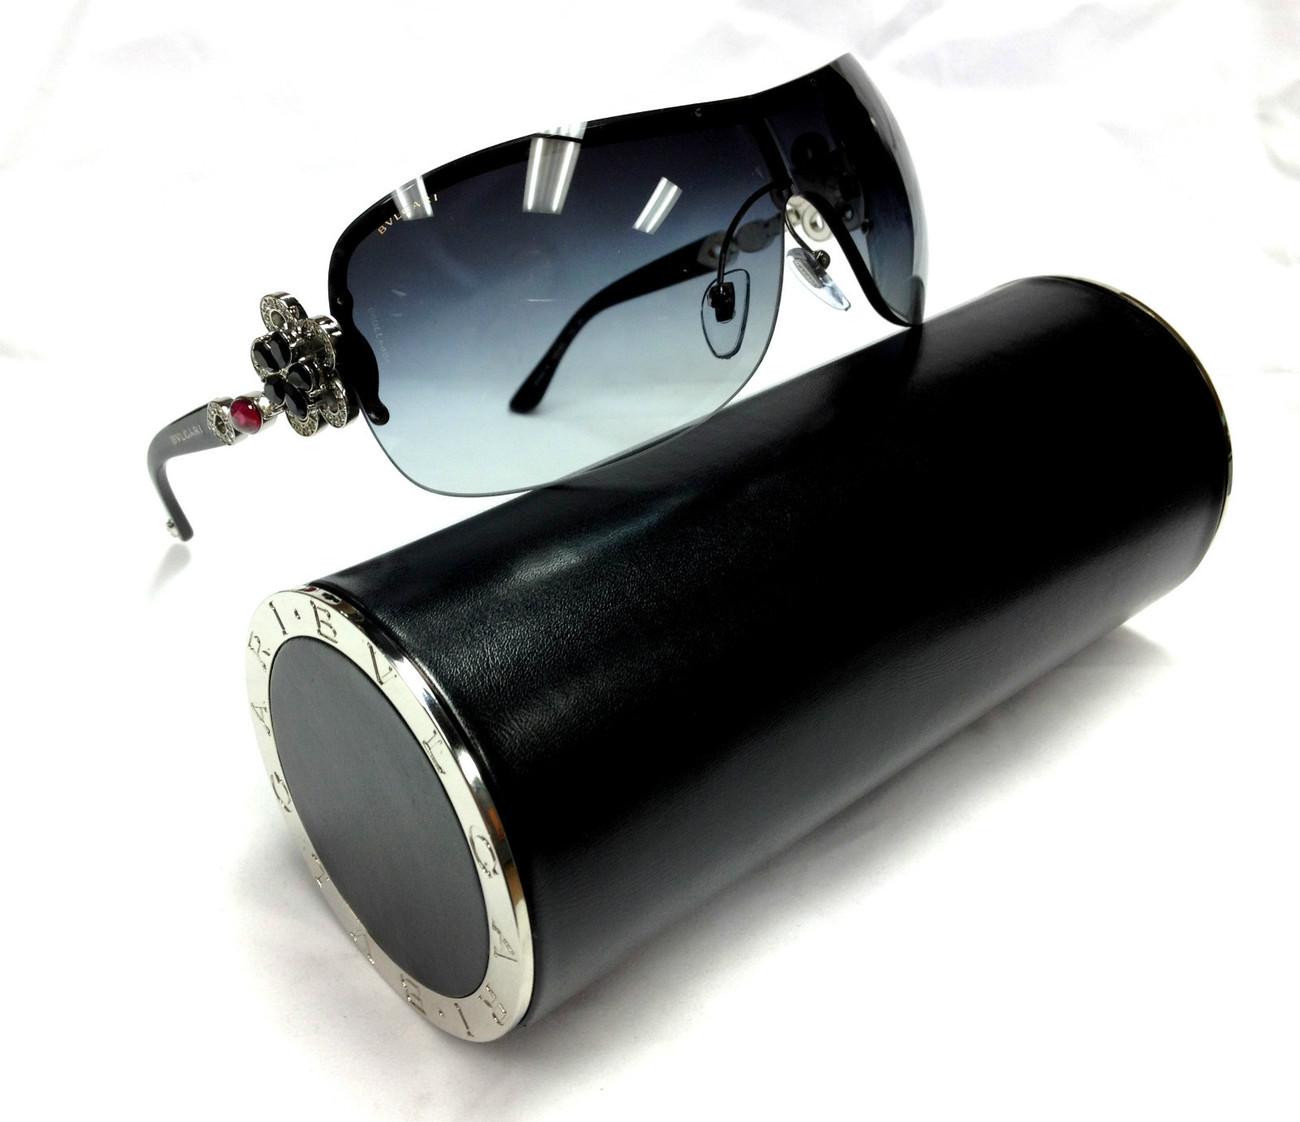 NEW Authentic BVLGARI Limited Mediterranean Black 6059B 6059 Sunglasses 102 8G - $450.00